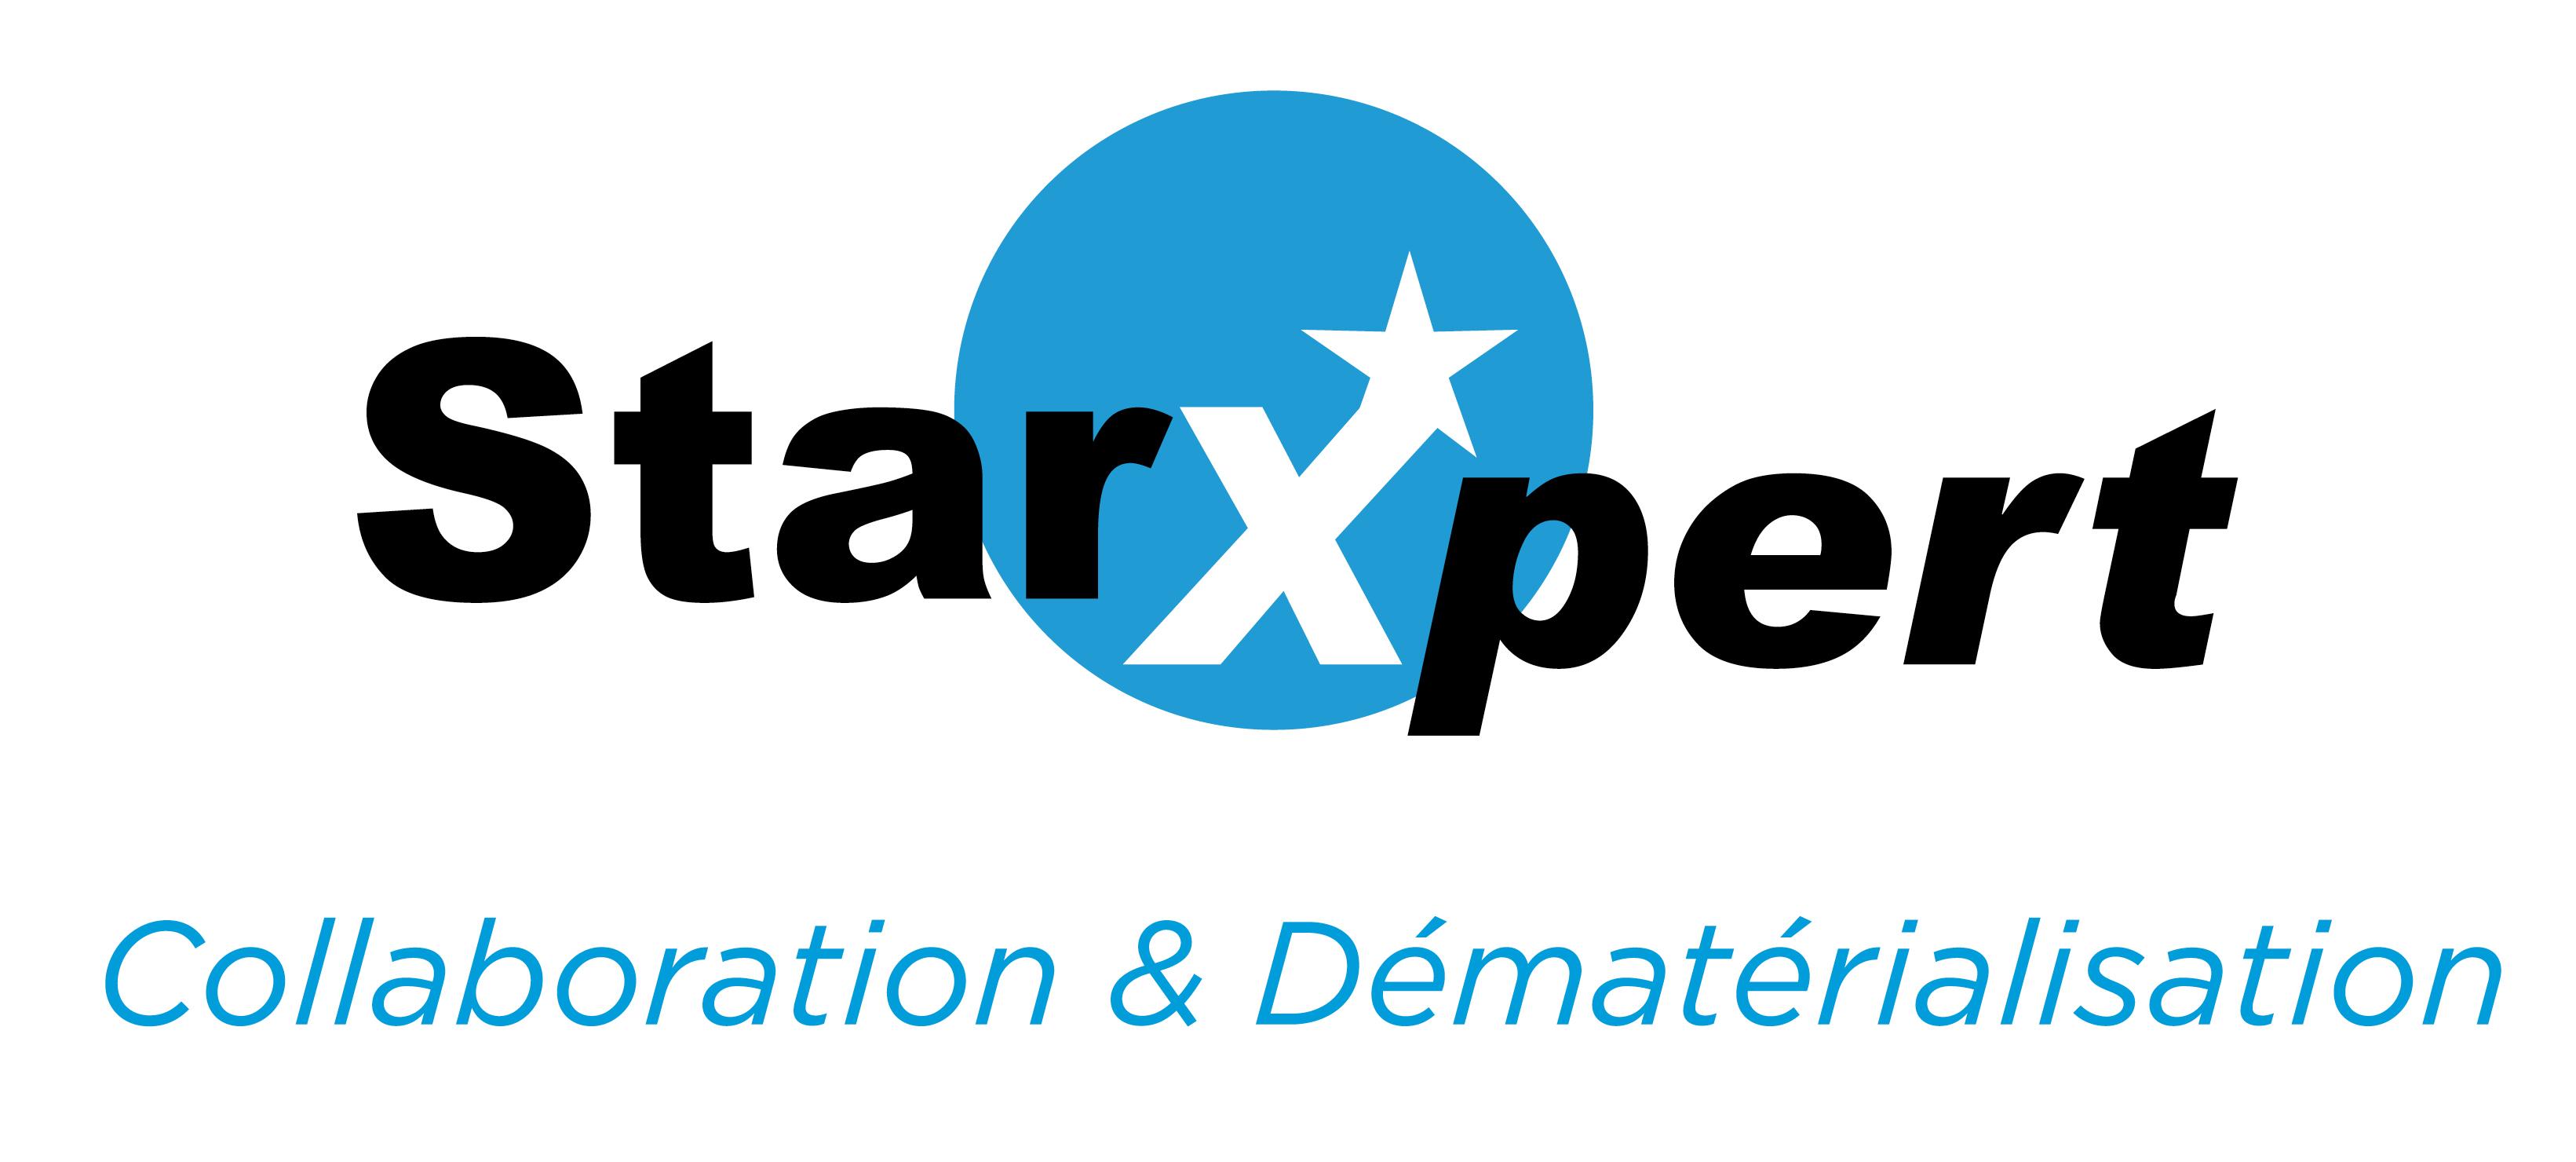 Starxpert